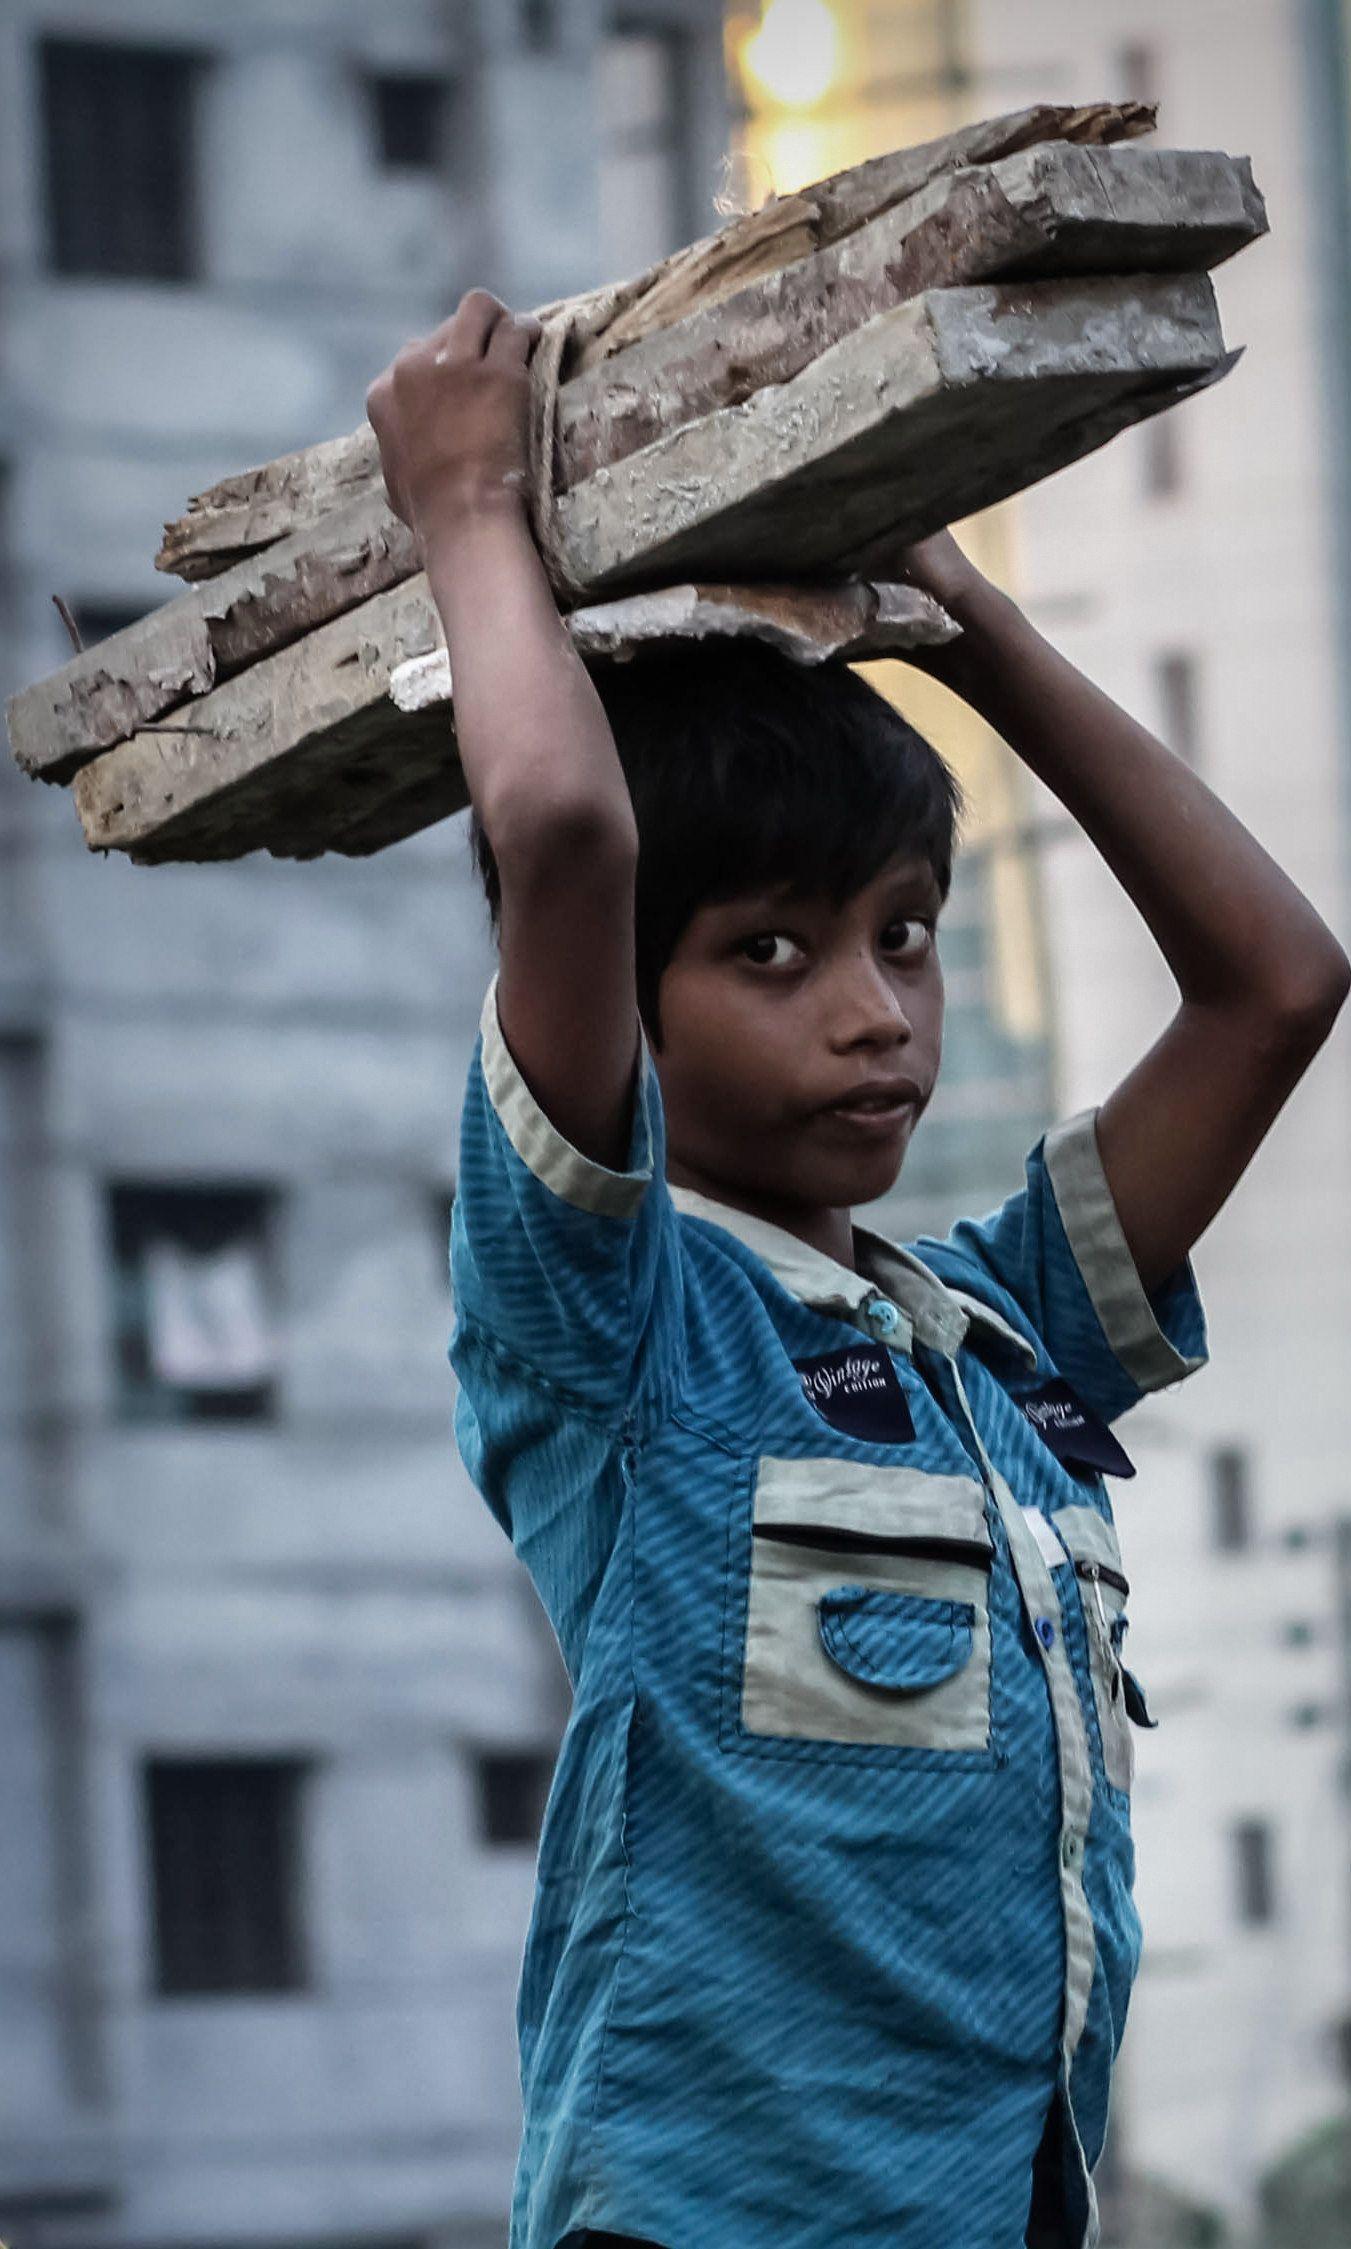 """Returning home after work"" Dhaka, Bangladesh Dhaka"